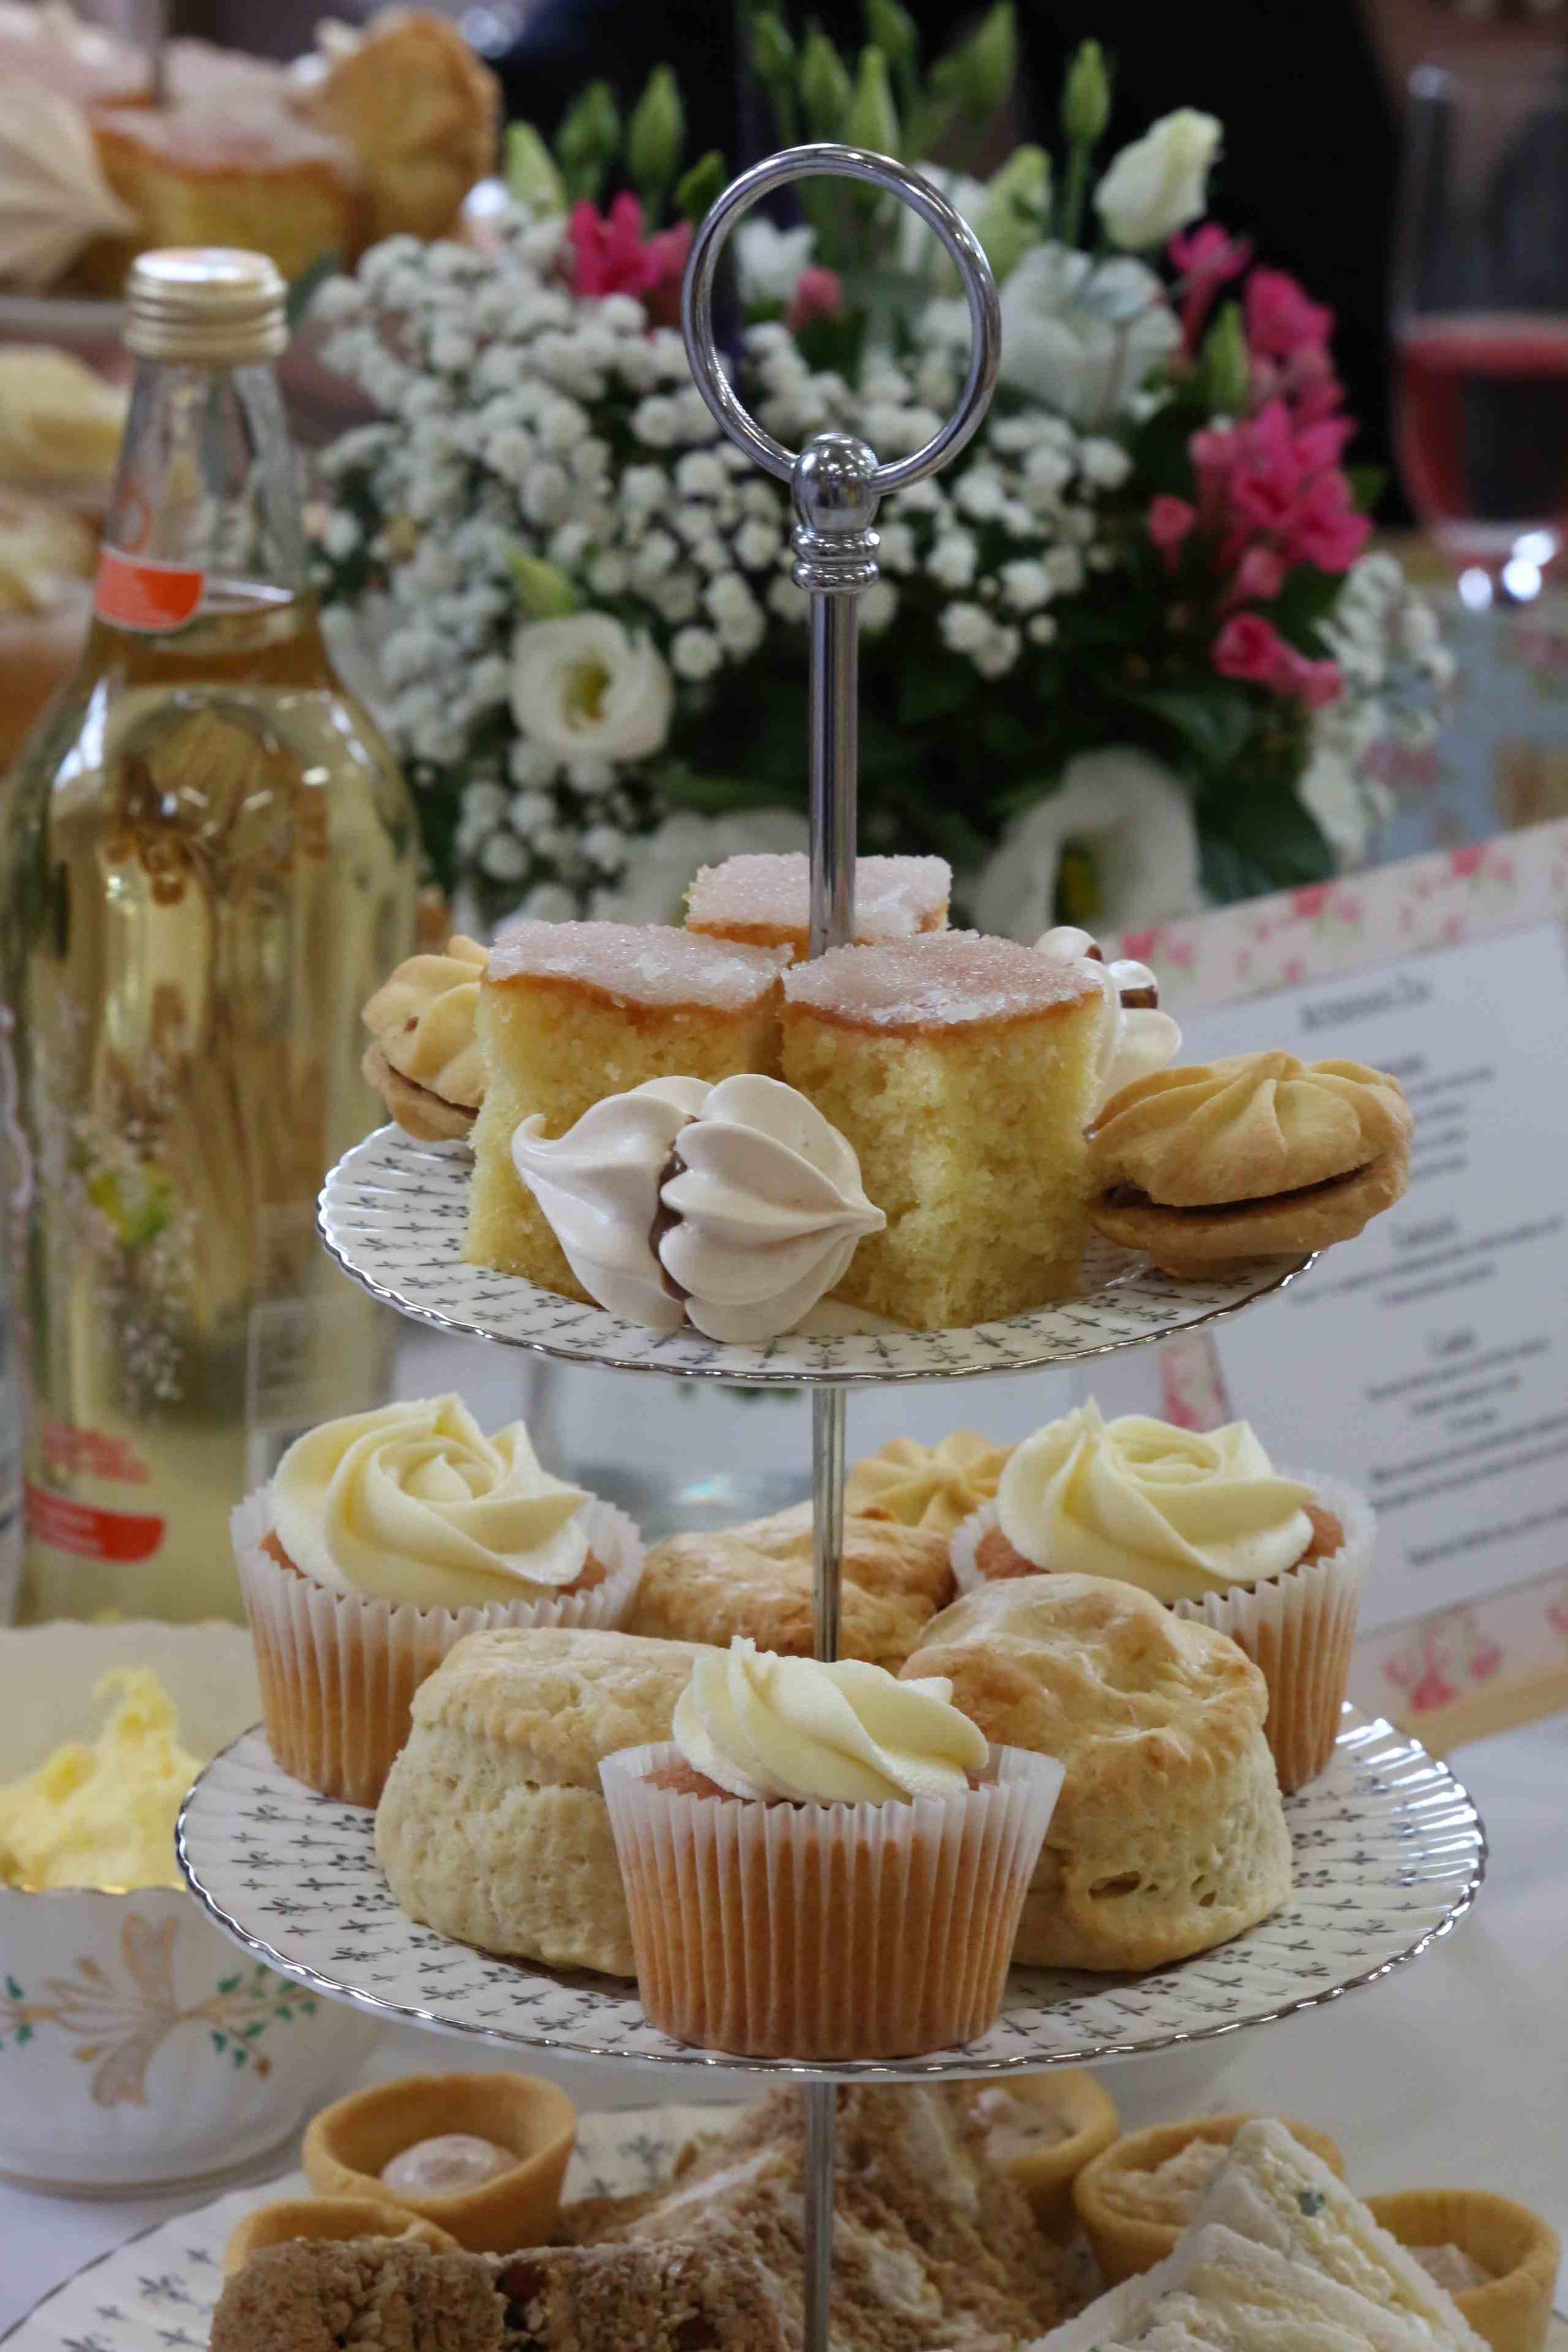 The afternoon tea selection for Sarah & Bens wedding